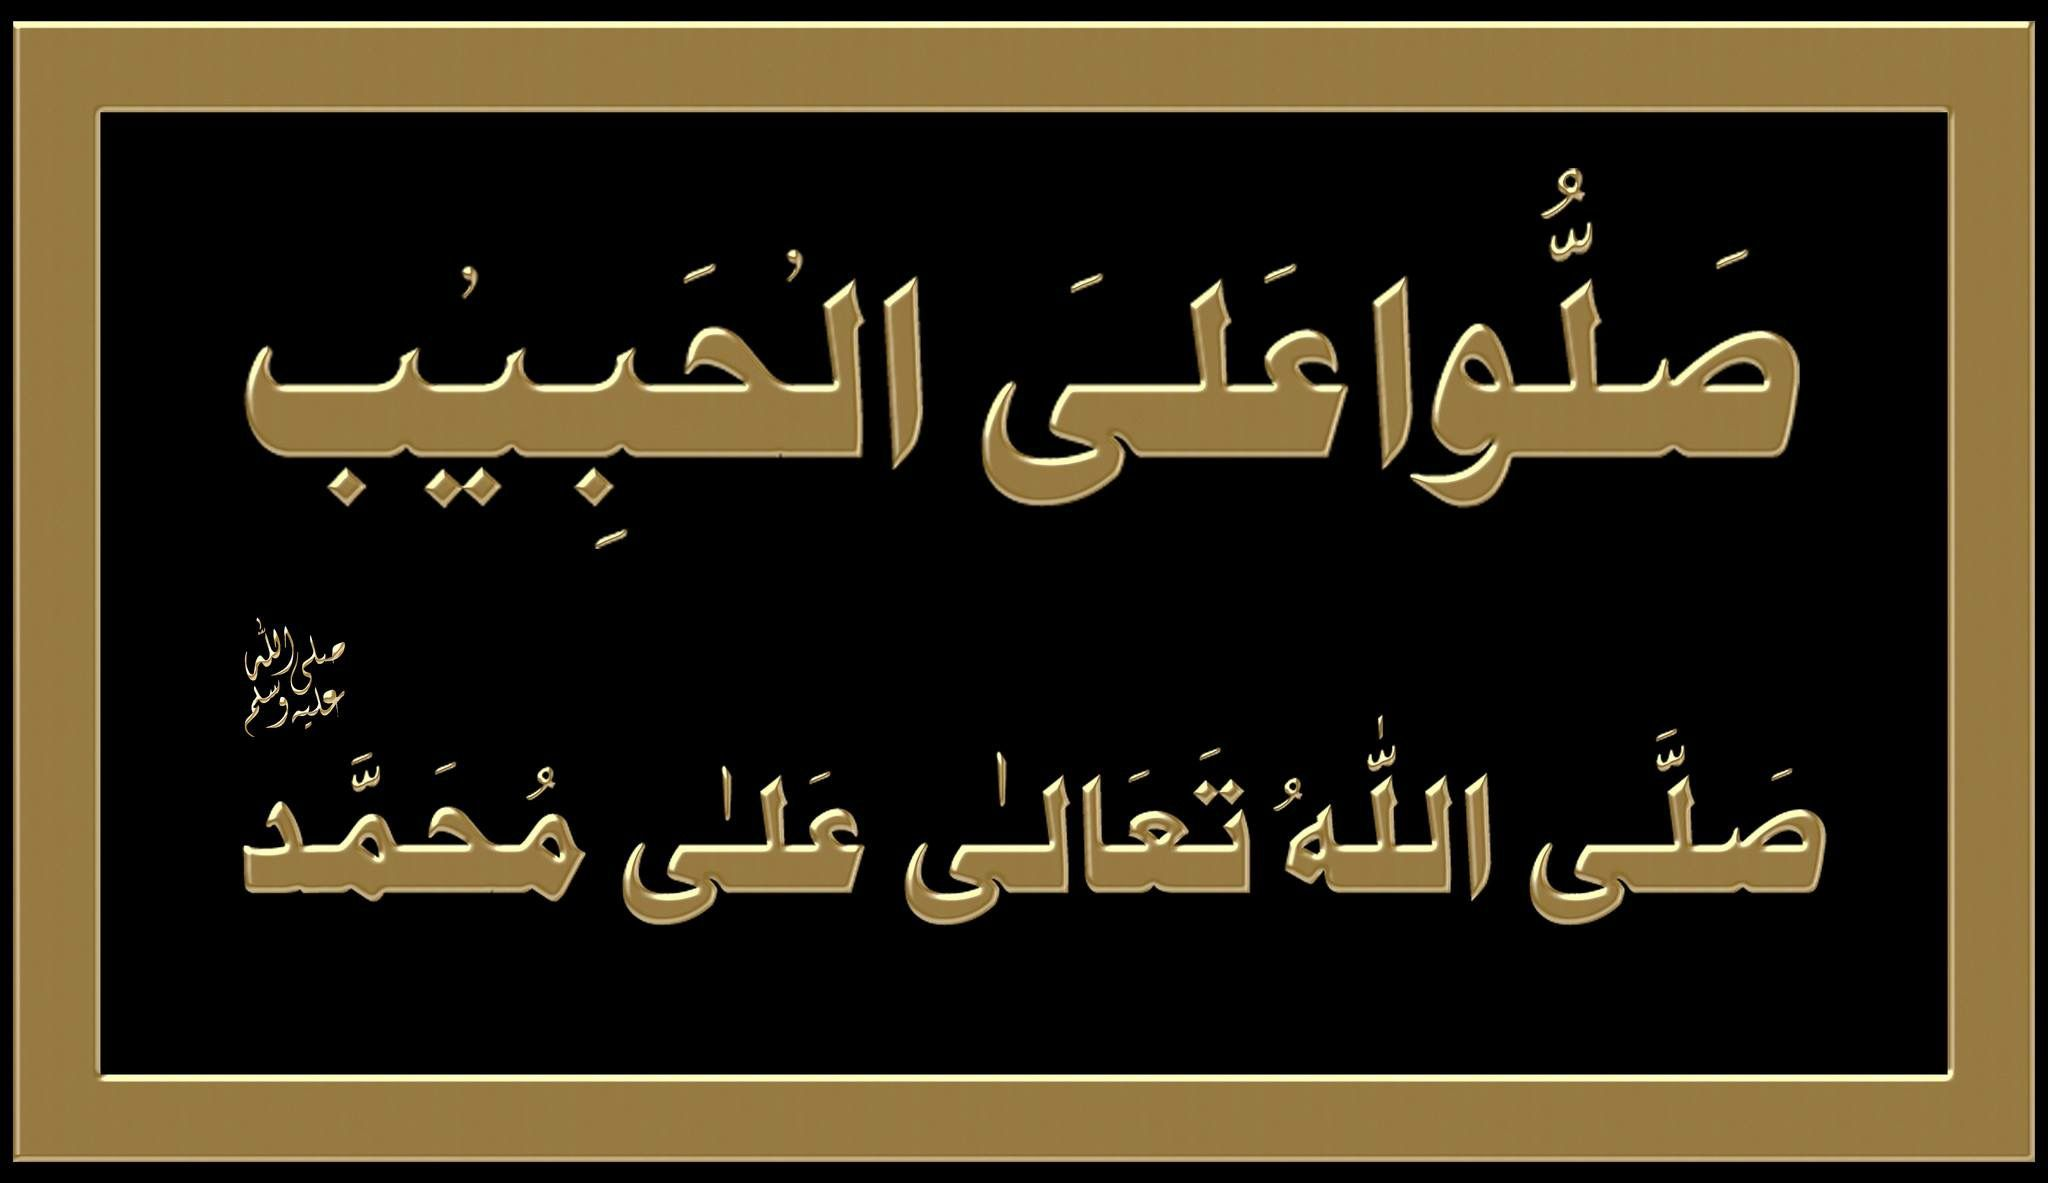 Pin by Sara Shaikh on islamic photos wallpaper Arabic